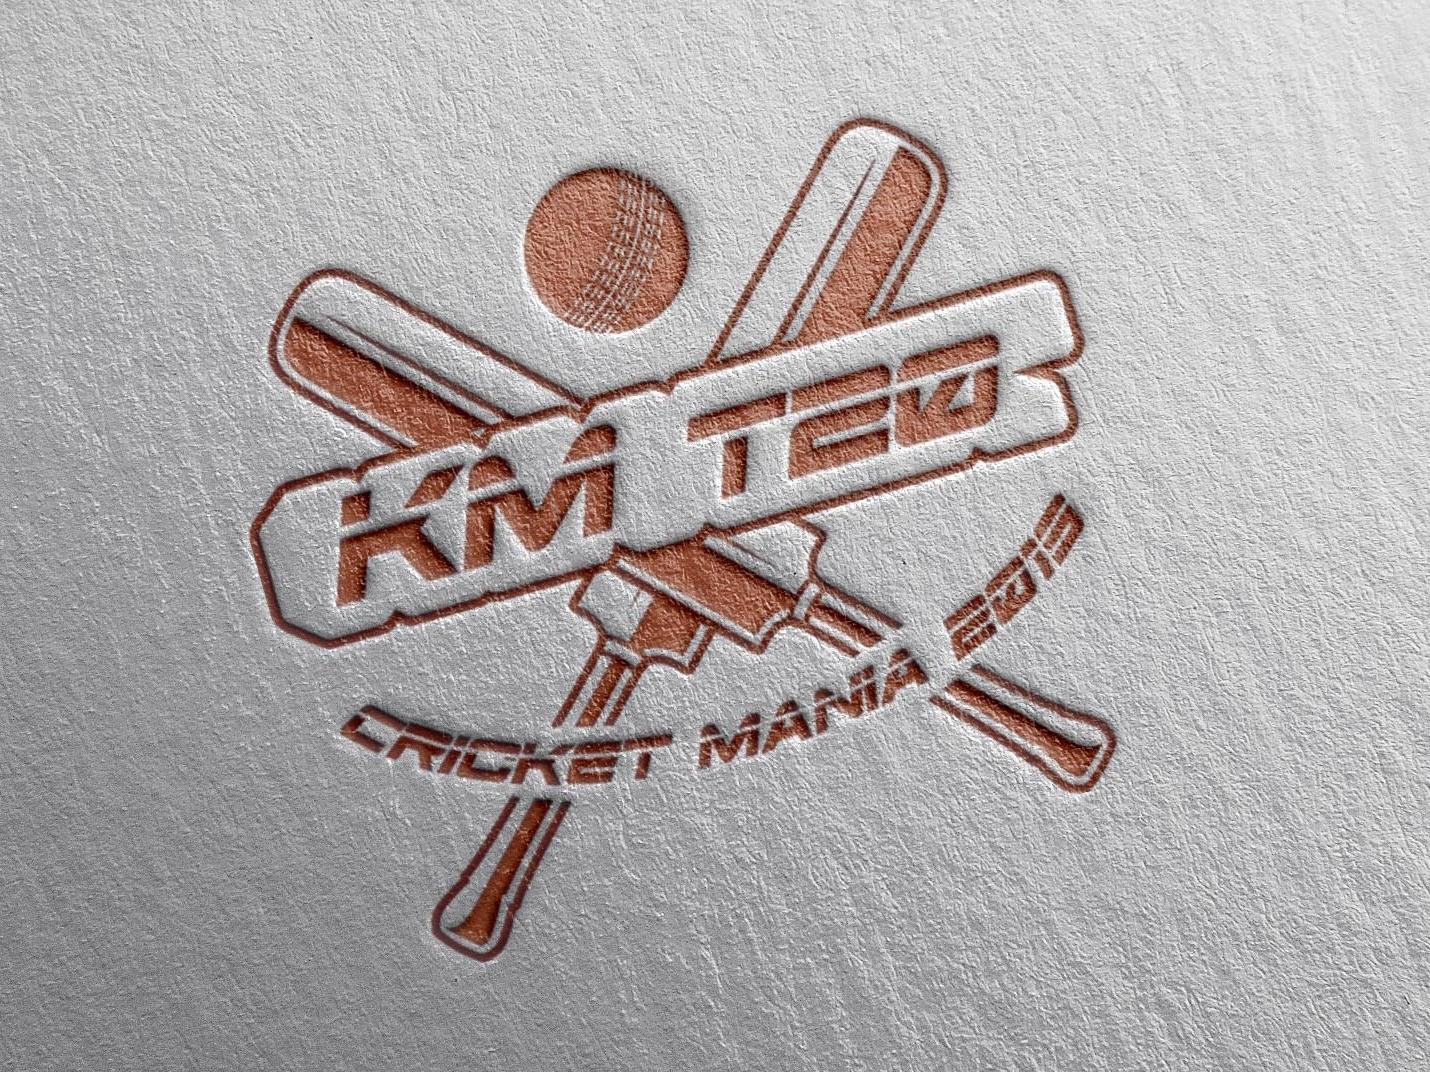 KM T20 Cricket League official Logo identity logo brand design graphic designing vector illustration graphic design creative design branding